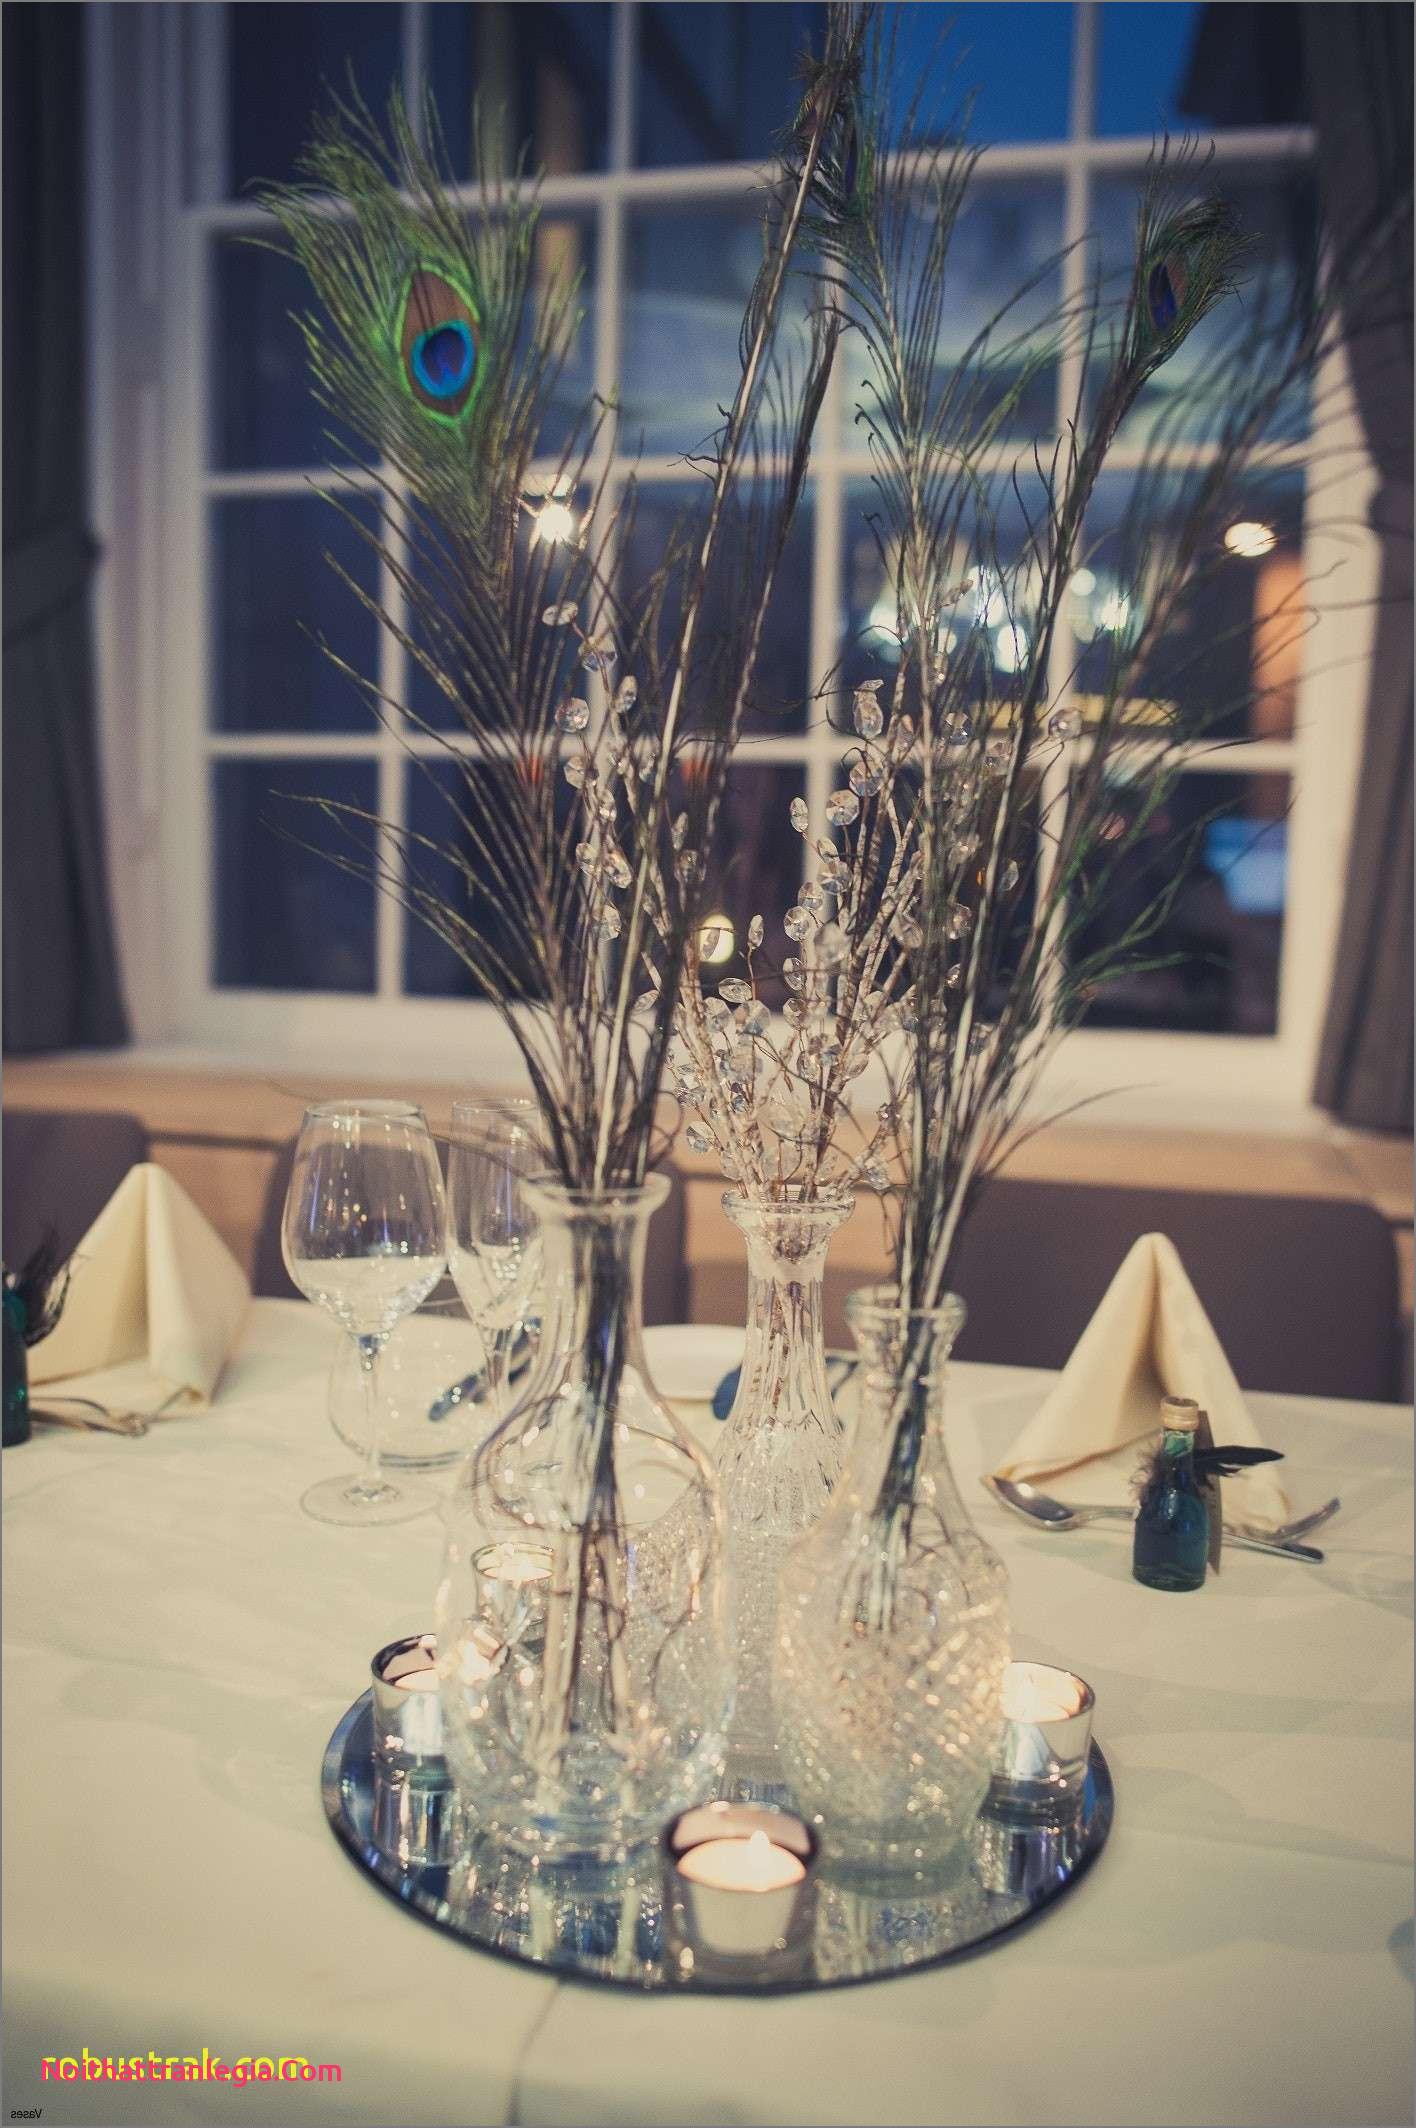 diy wedding vase centerpieces of 20 wedding vases noithattranlegia vases design for dollar tree wedding decorations awesome h vases dollar vase i 0d scheme doller tree